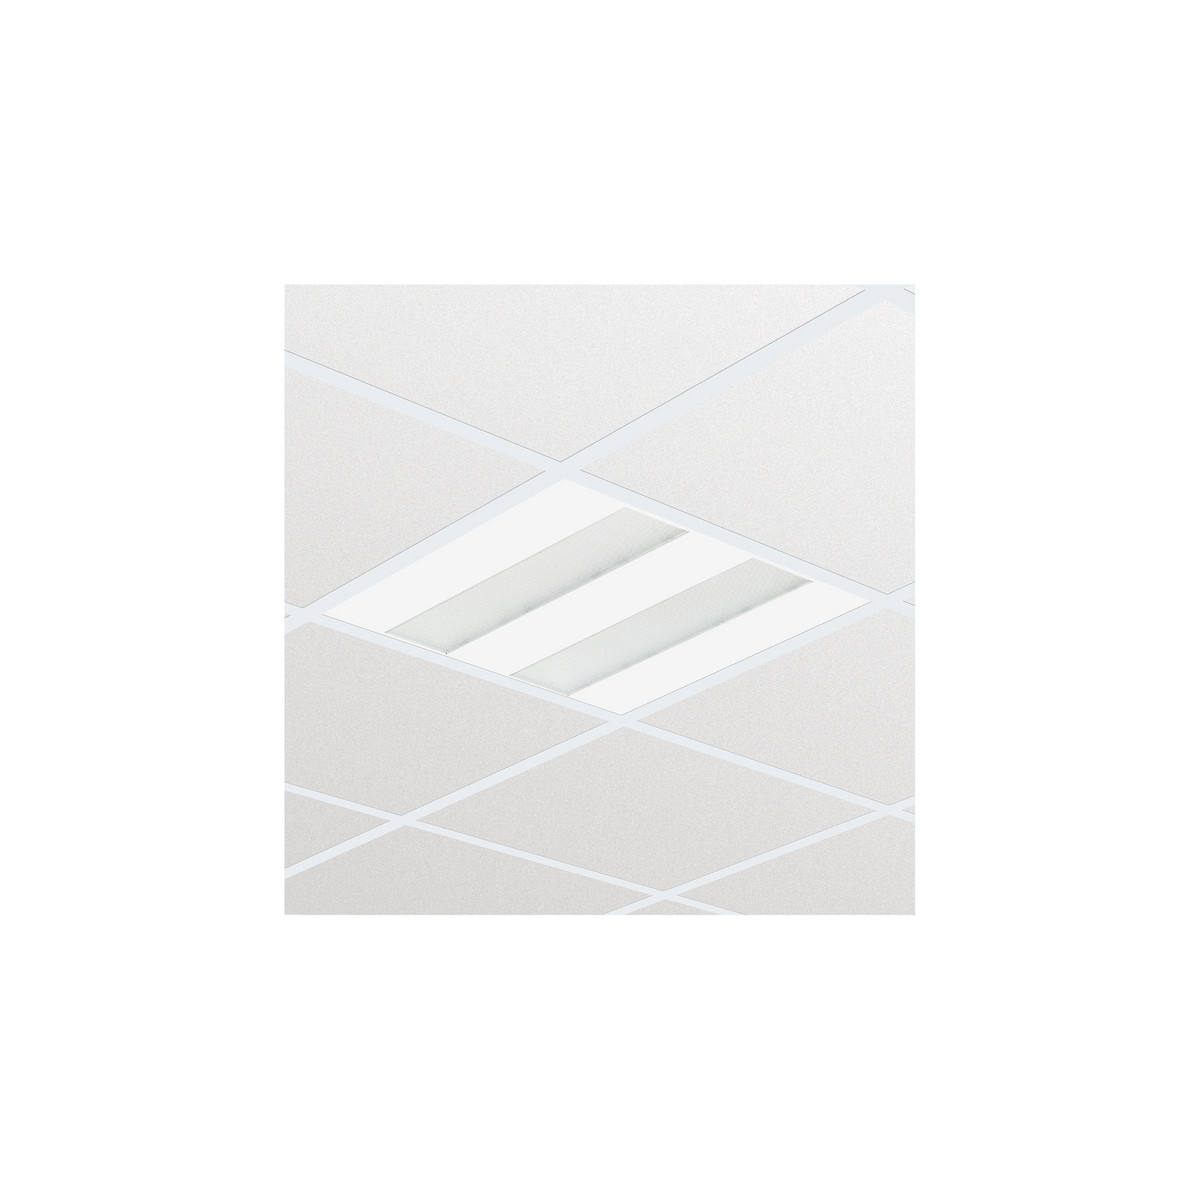 Philips FlexBlend Indbyg RC340B 3600lm/930 60x60 Synlig T-skinne PCS-optik SpaceWise